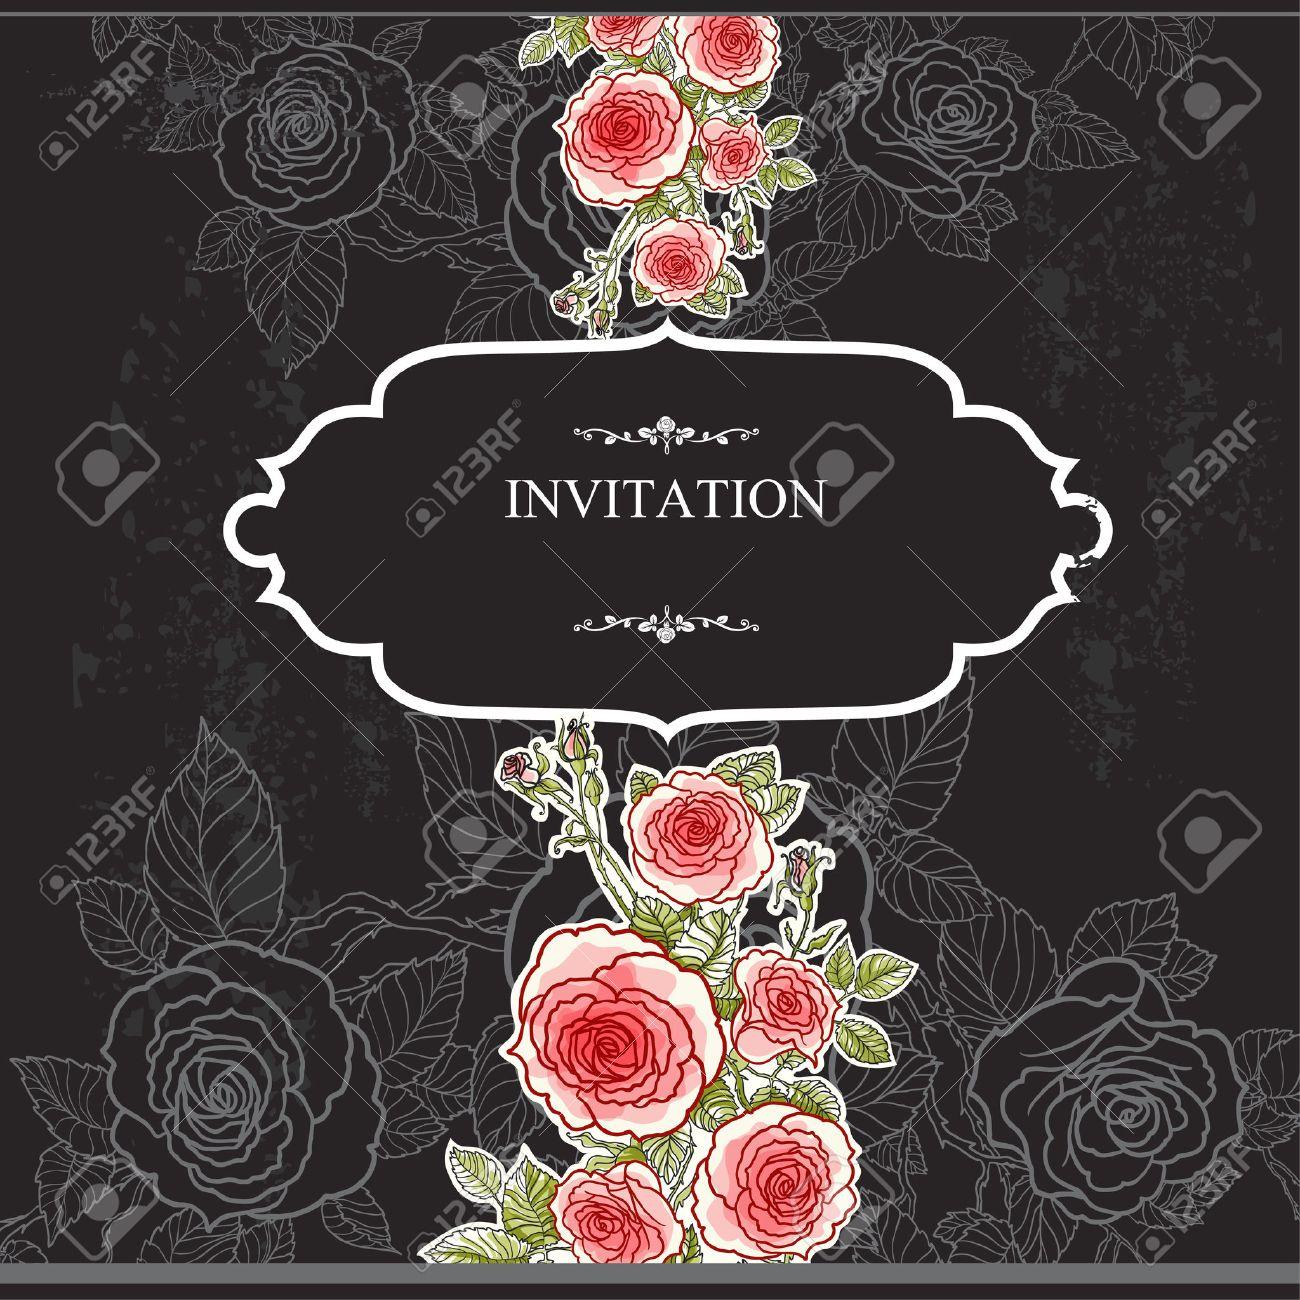 Vintage invitation with roses on black background. - 32770285